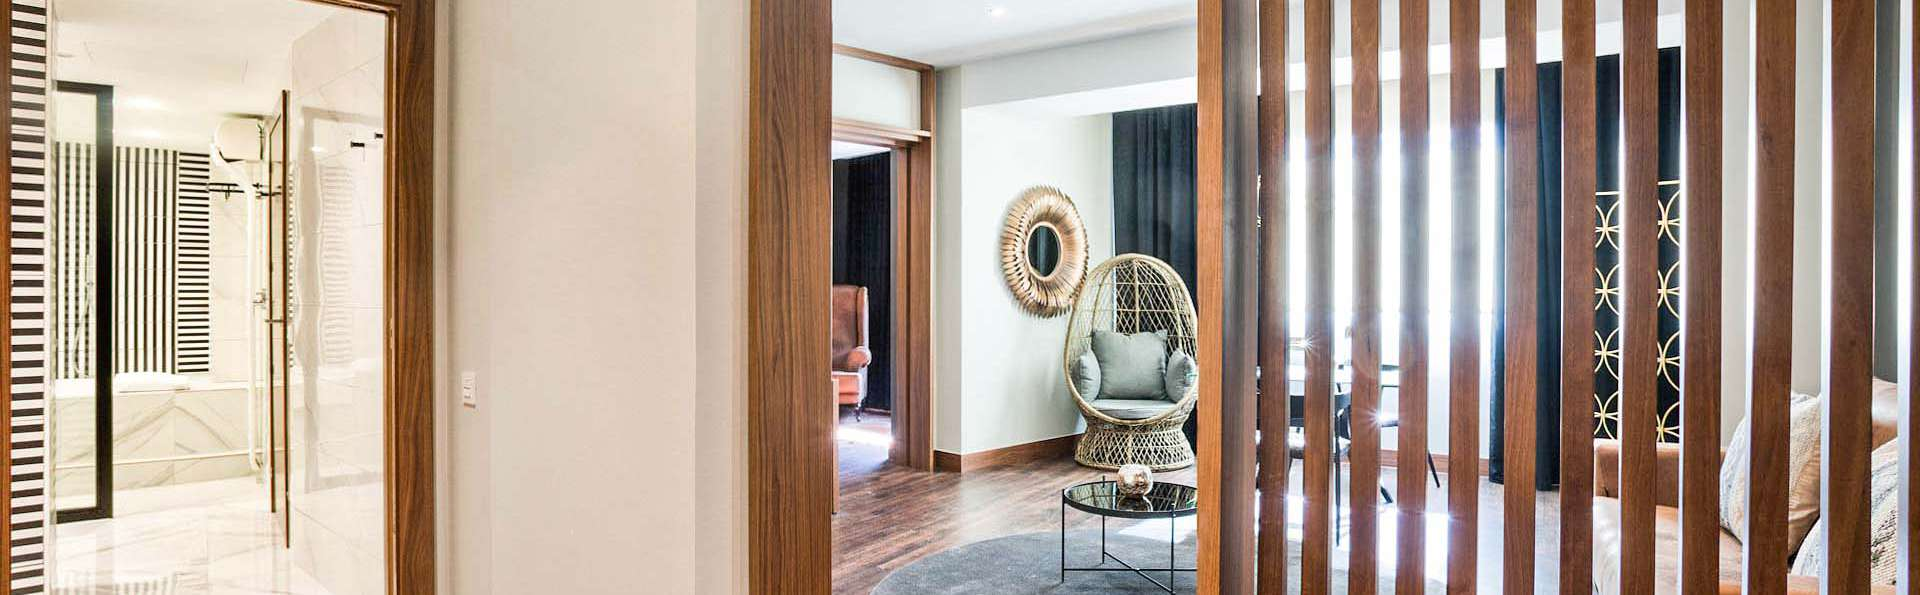 Hotel Tres Reyes  - EDIT_Hotel_Tres_Reyes-abril_01.jpg